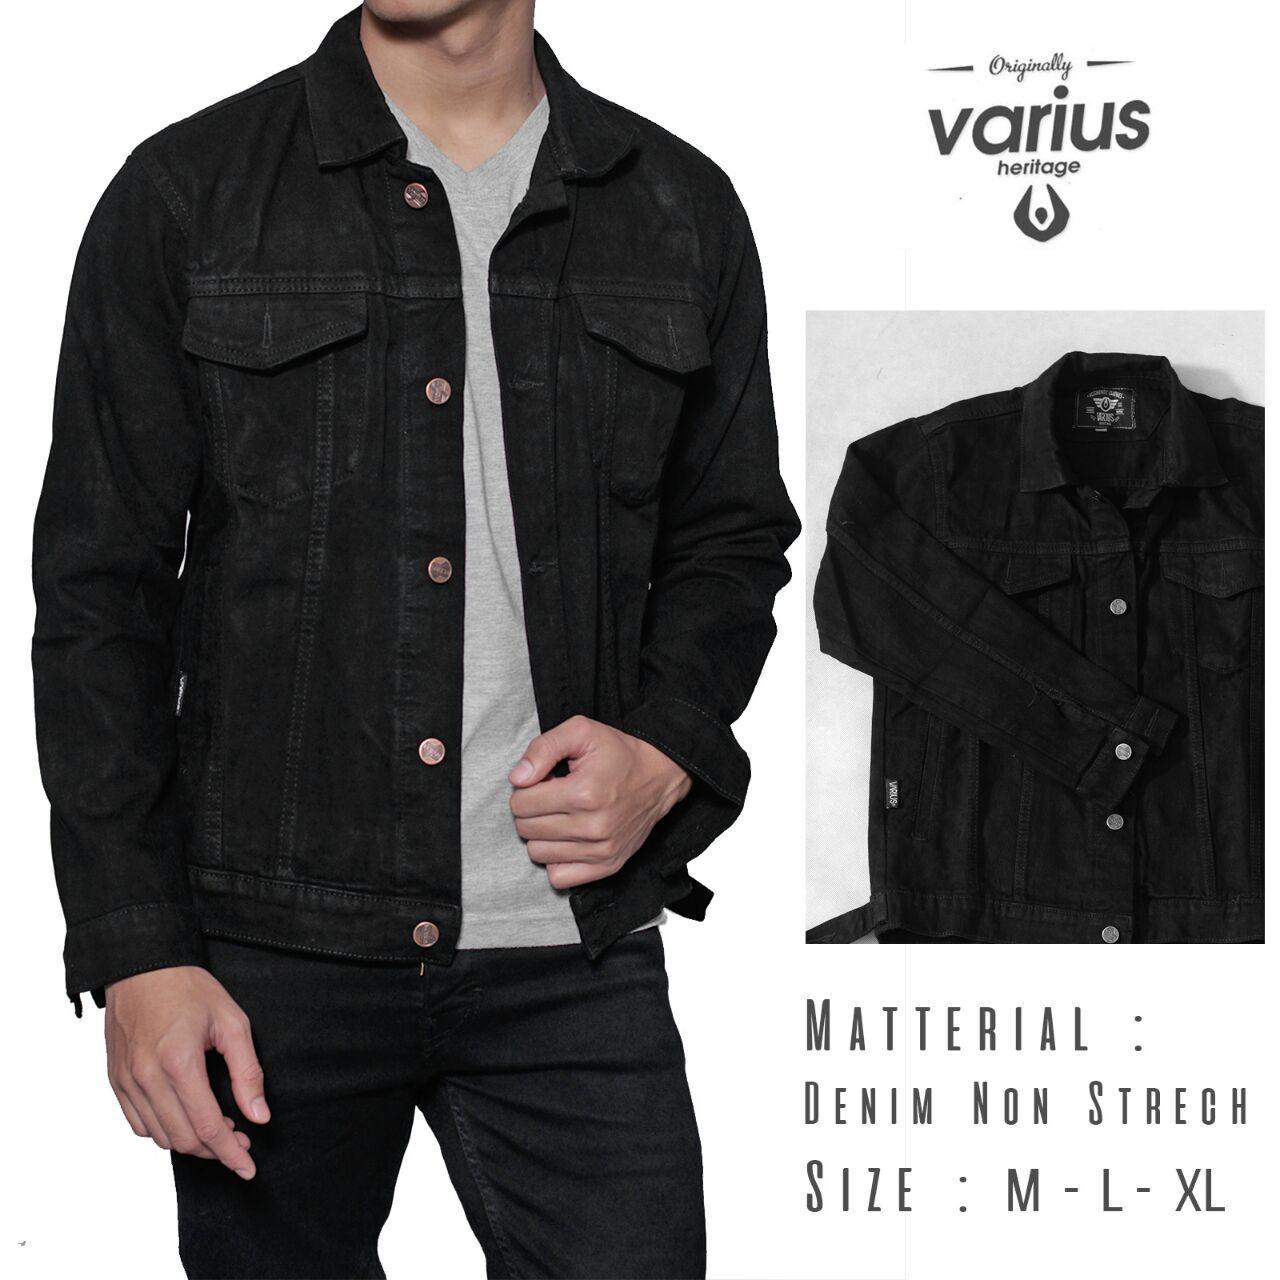 Jaket jeans original / jaket jeans premium / jaket jeans pria / jaket jeans / jaket